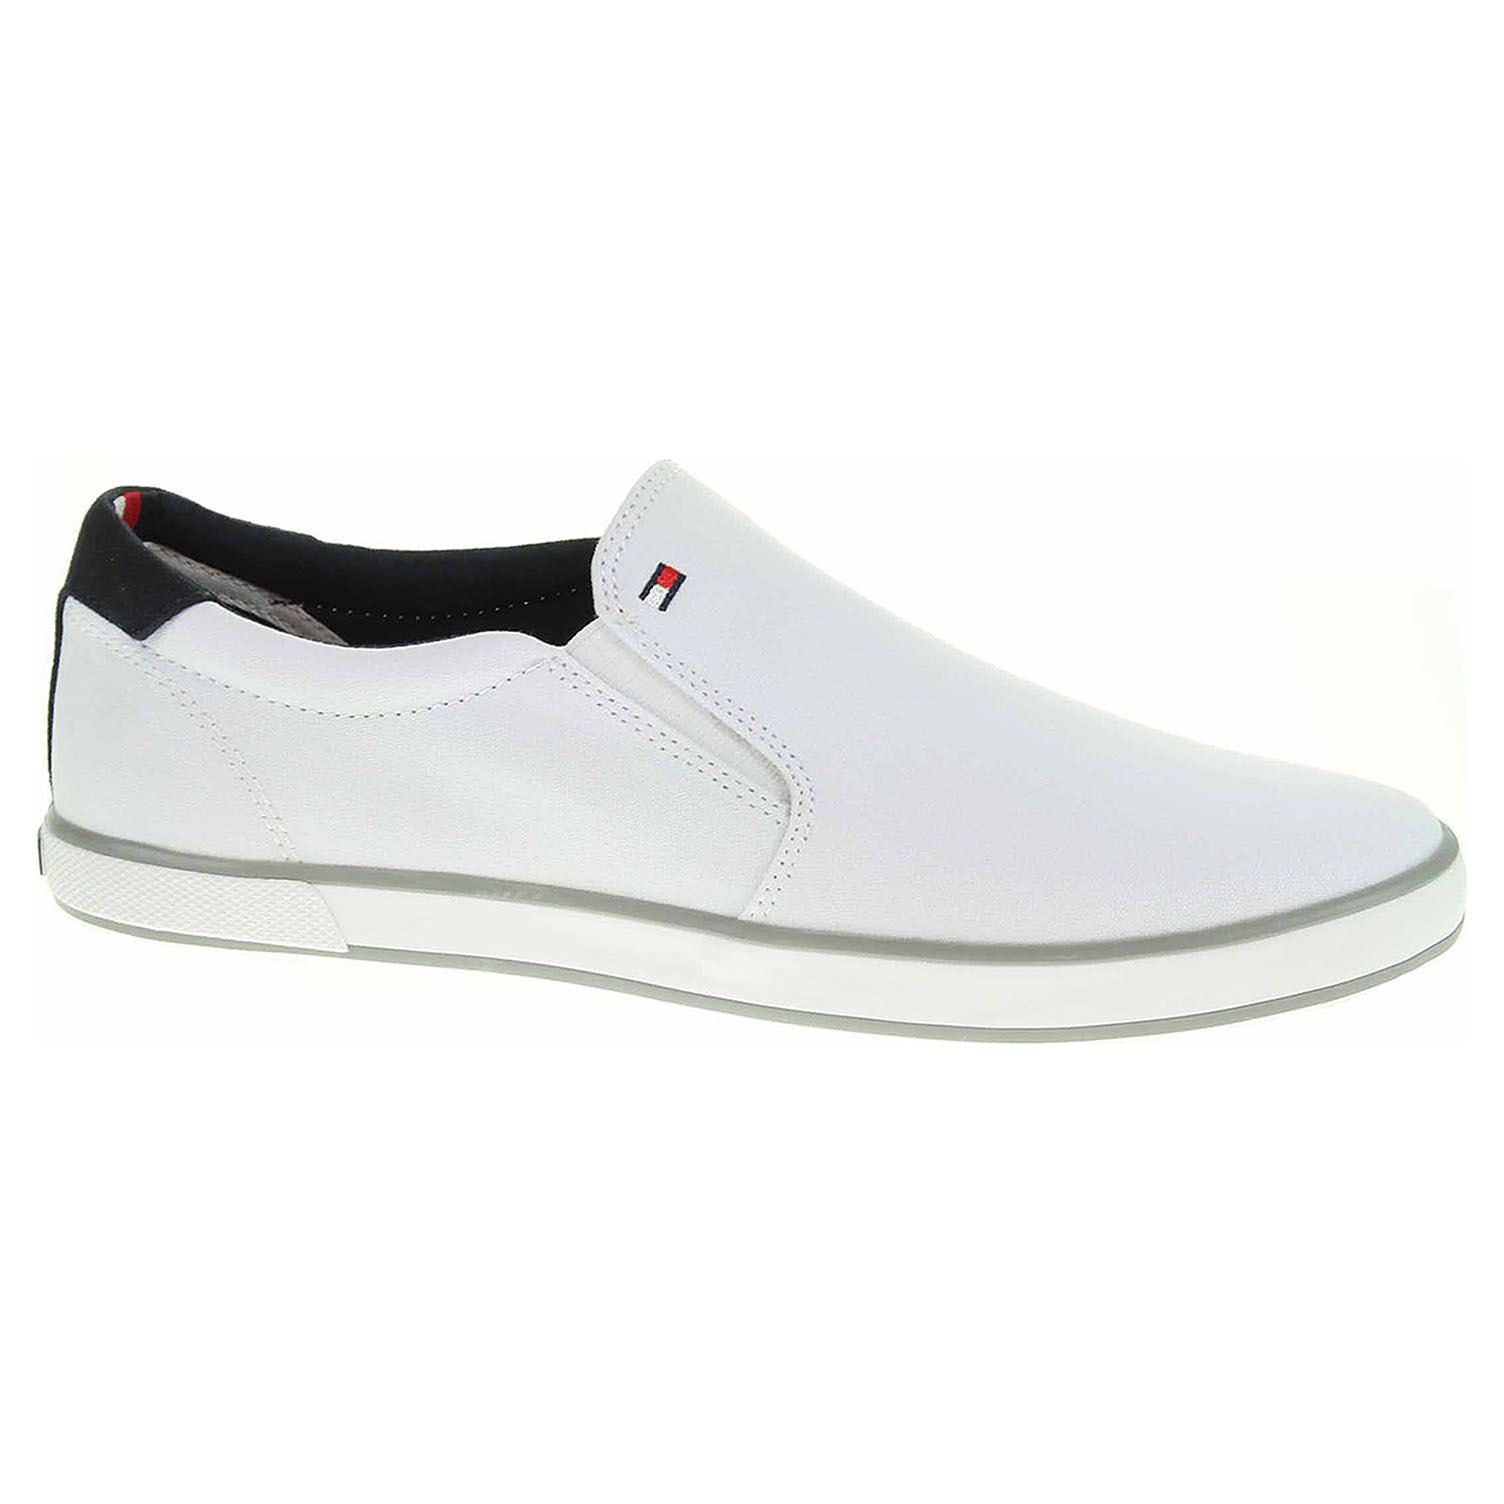 3e4ff89abe5b Ecco Pánská obuv Tommy Hilfiger FM0FM00597 white 24000466